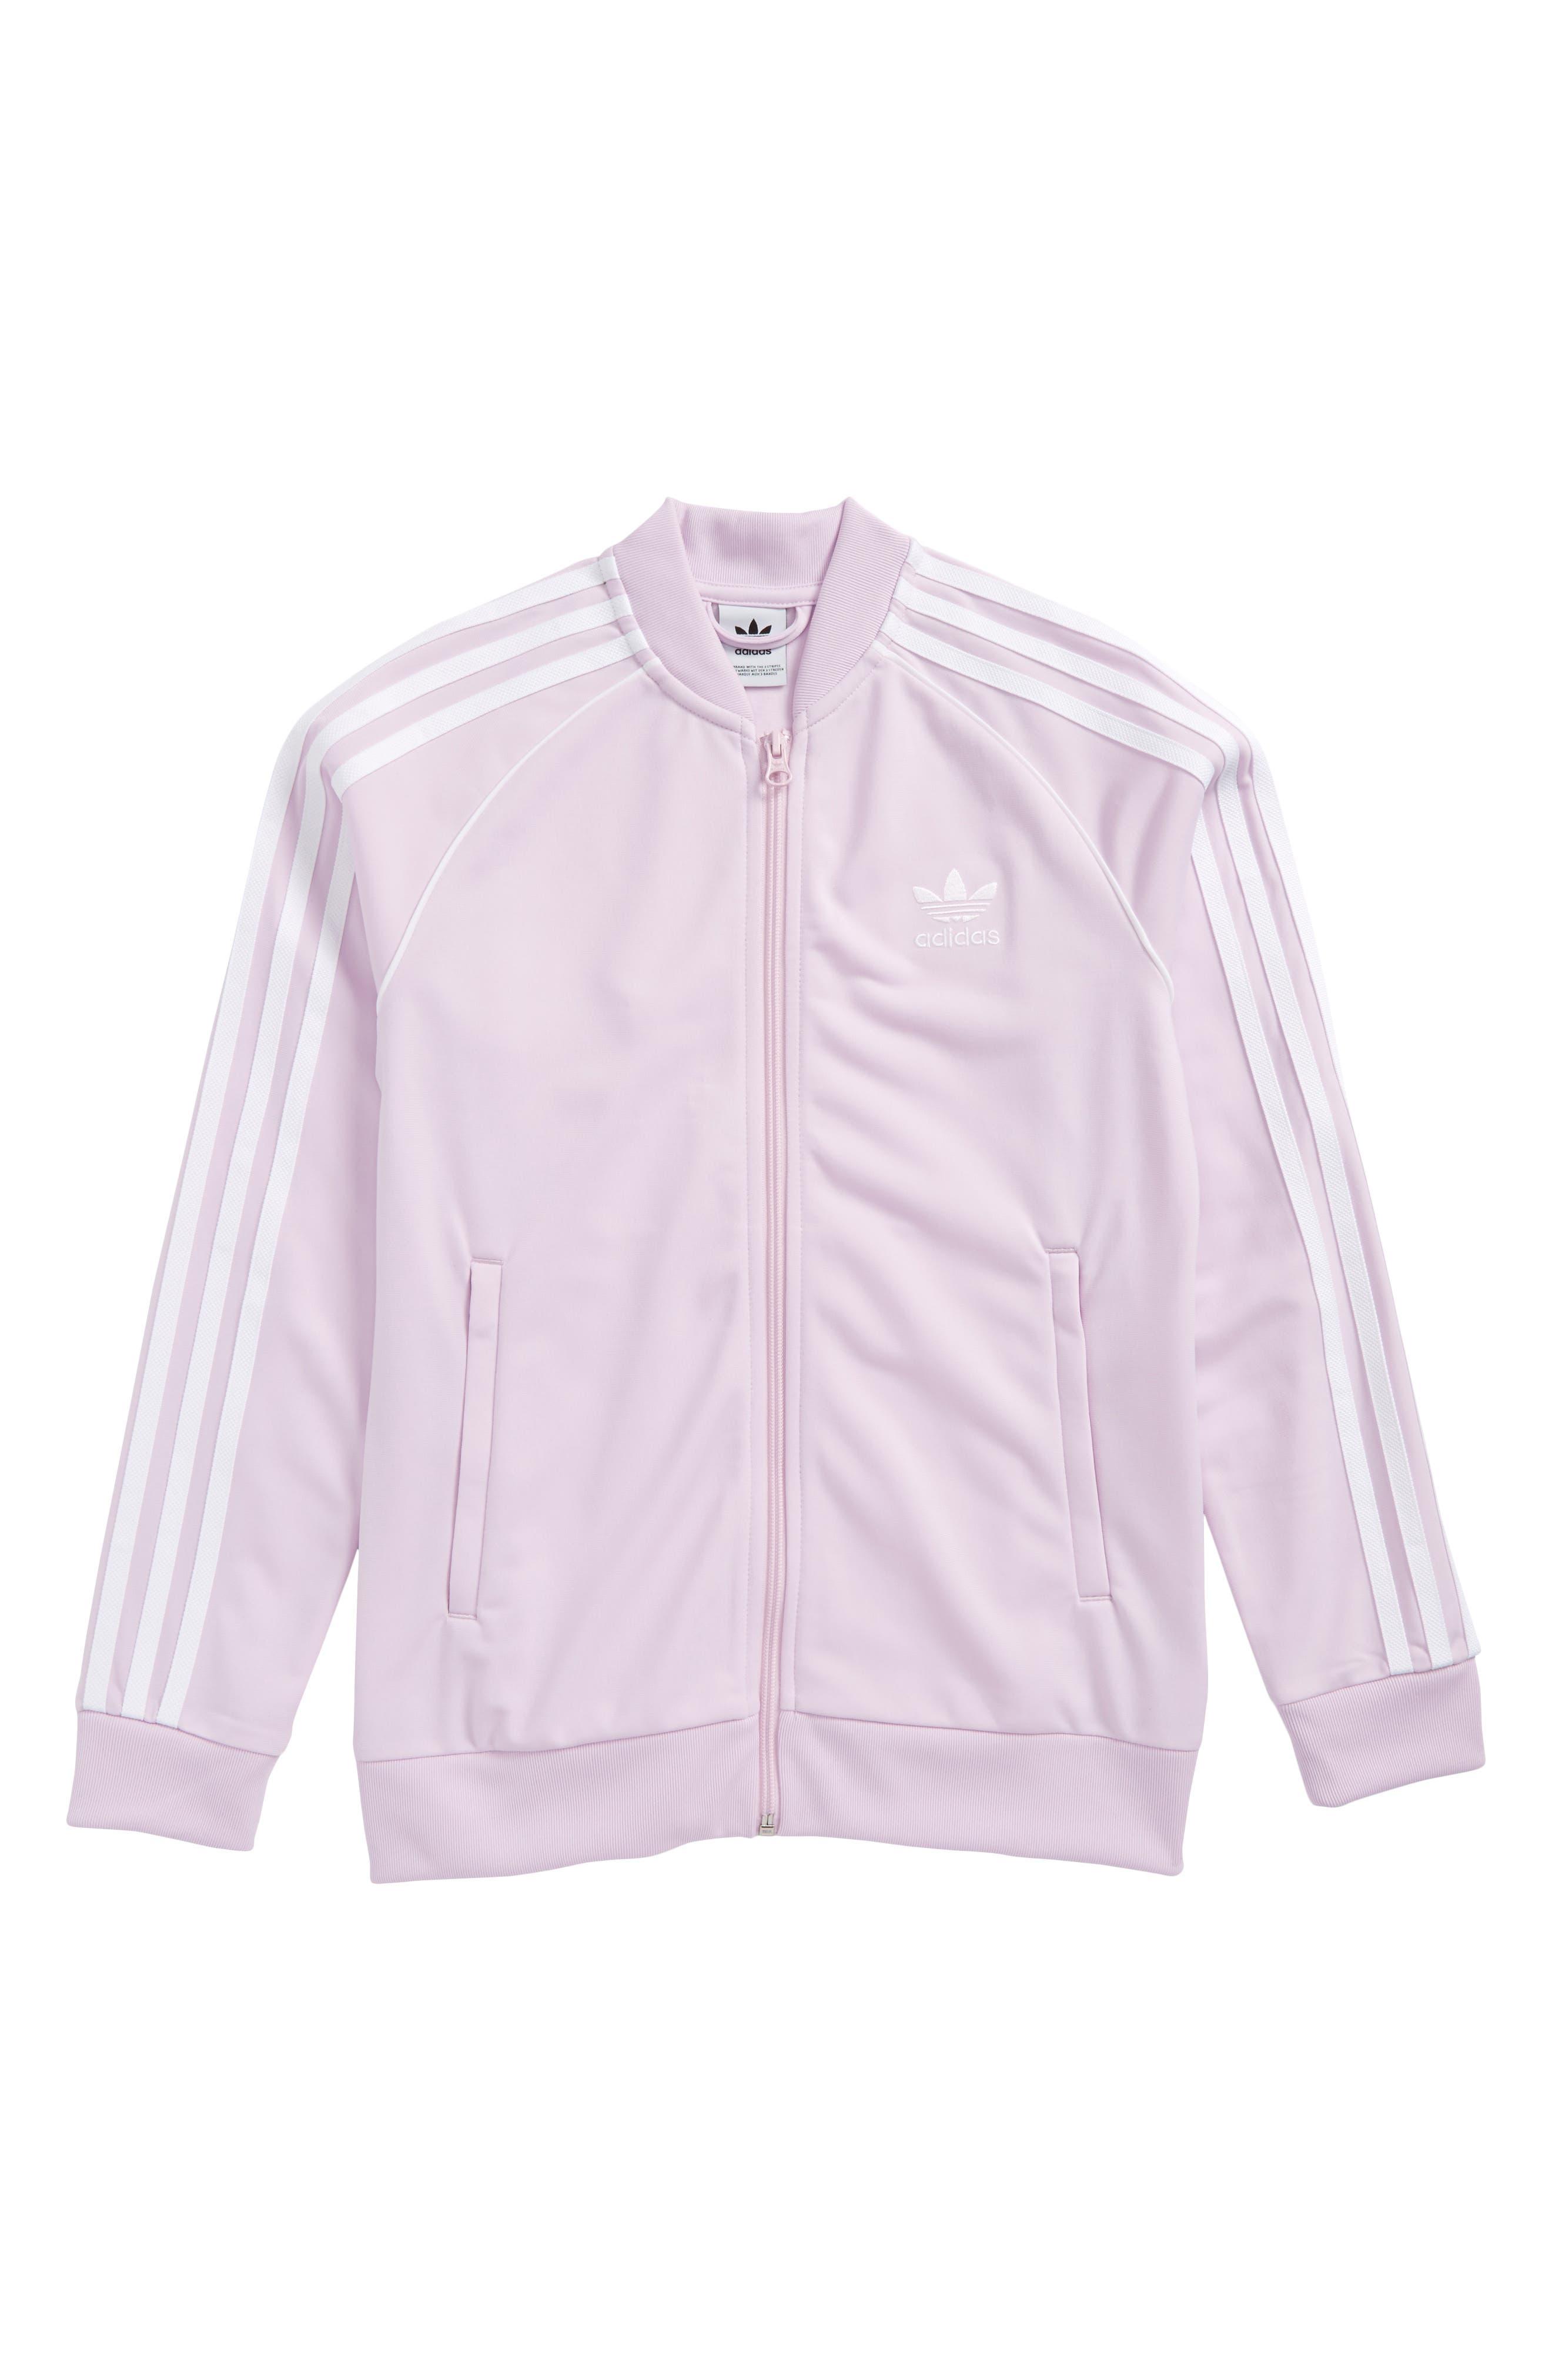 adidas SST Track Jacket,                         Main,                         color, Pink